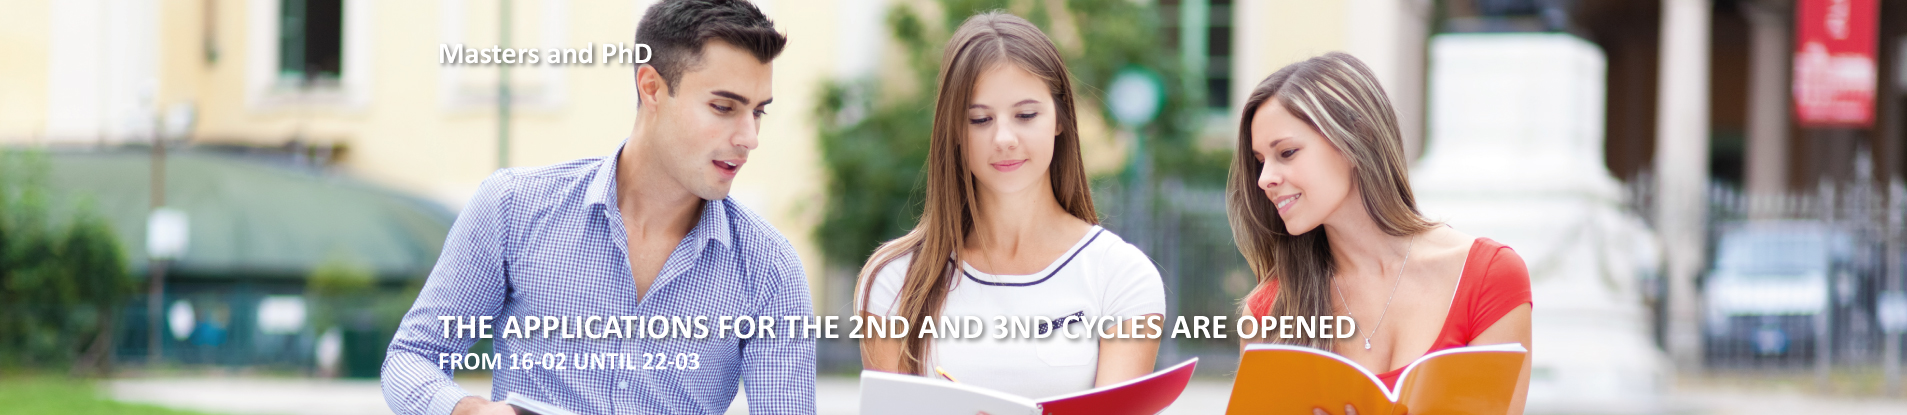 slider candidaturas 2 3 ciclos 2021-22